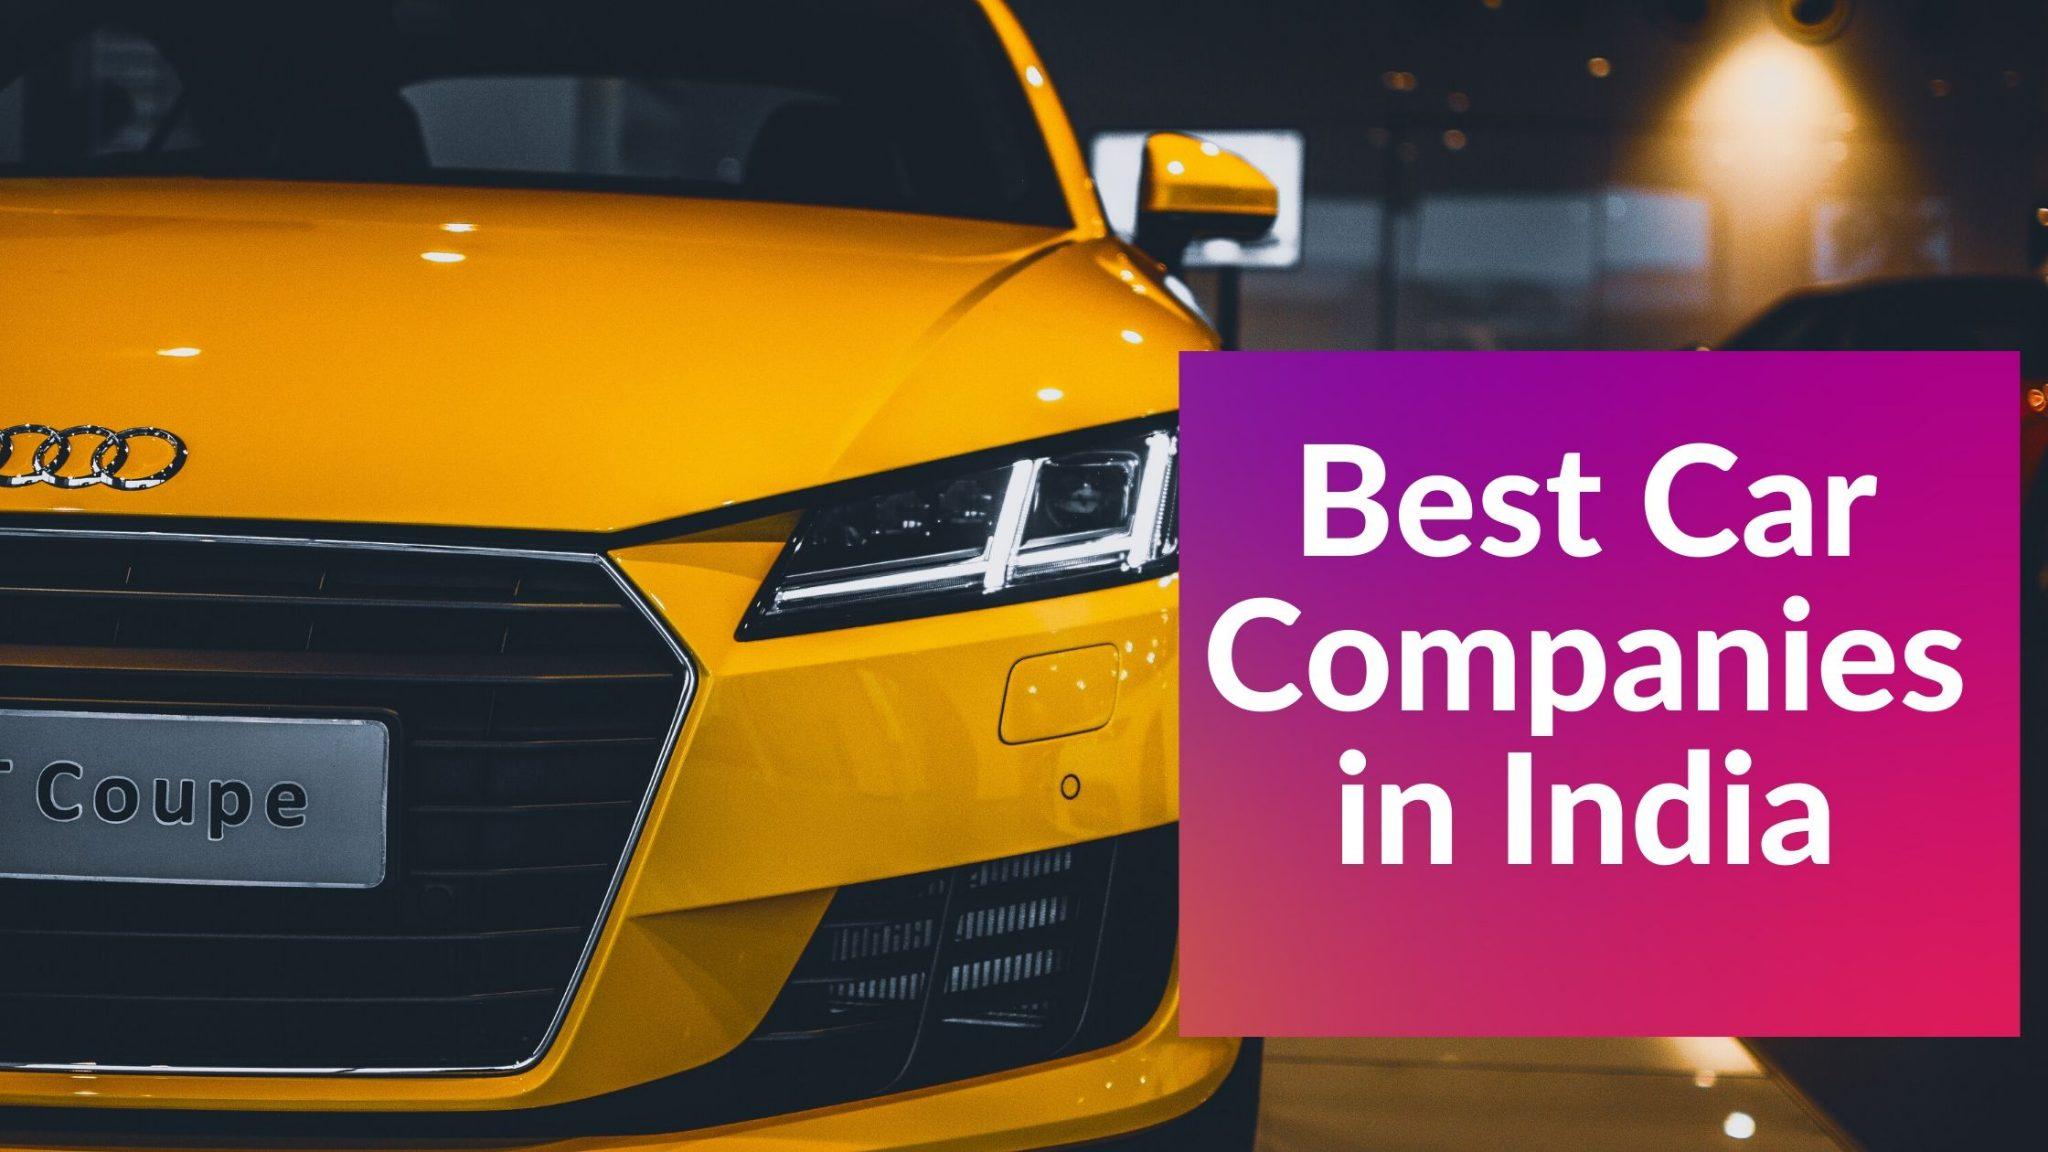 Best Car Companies in India